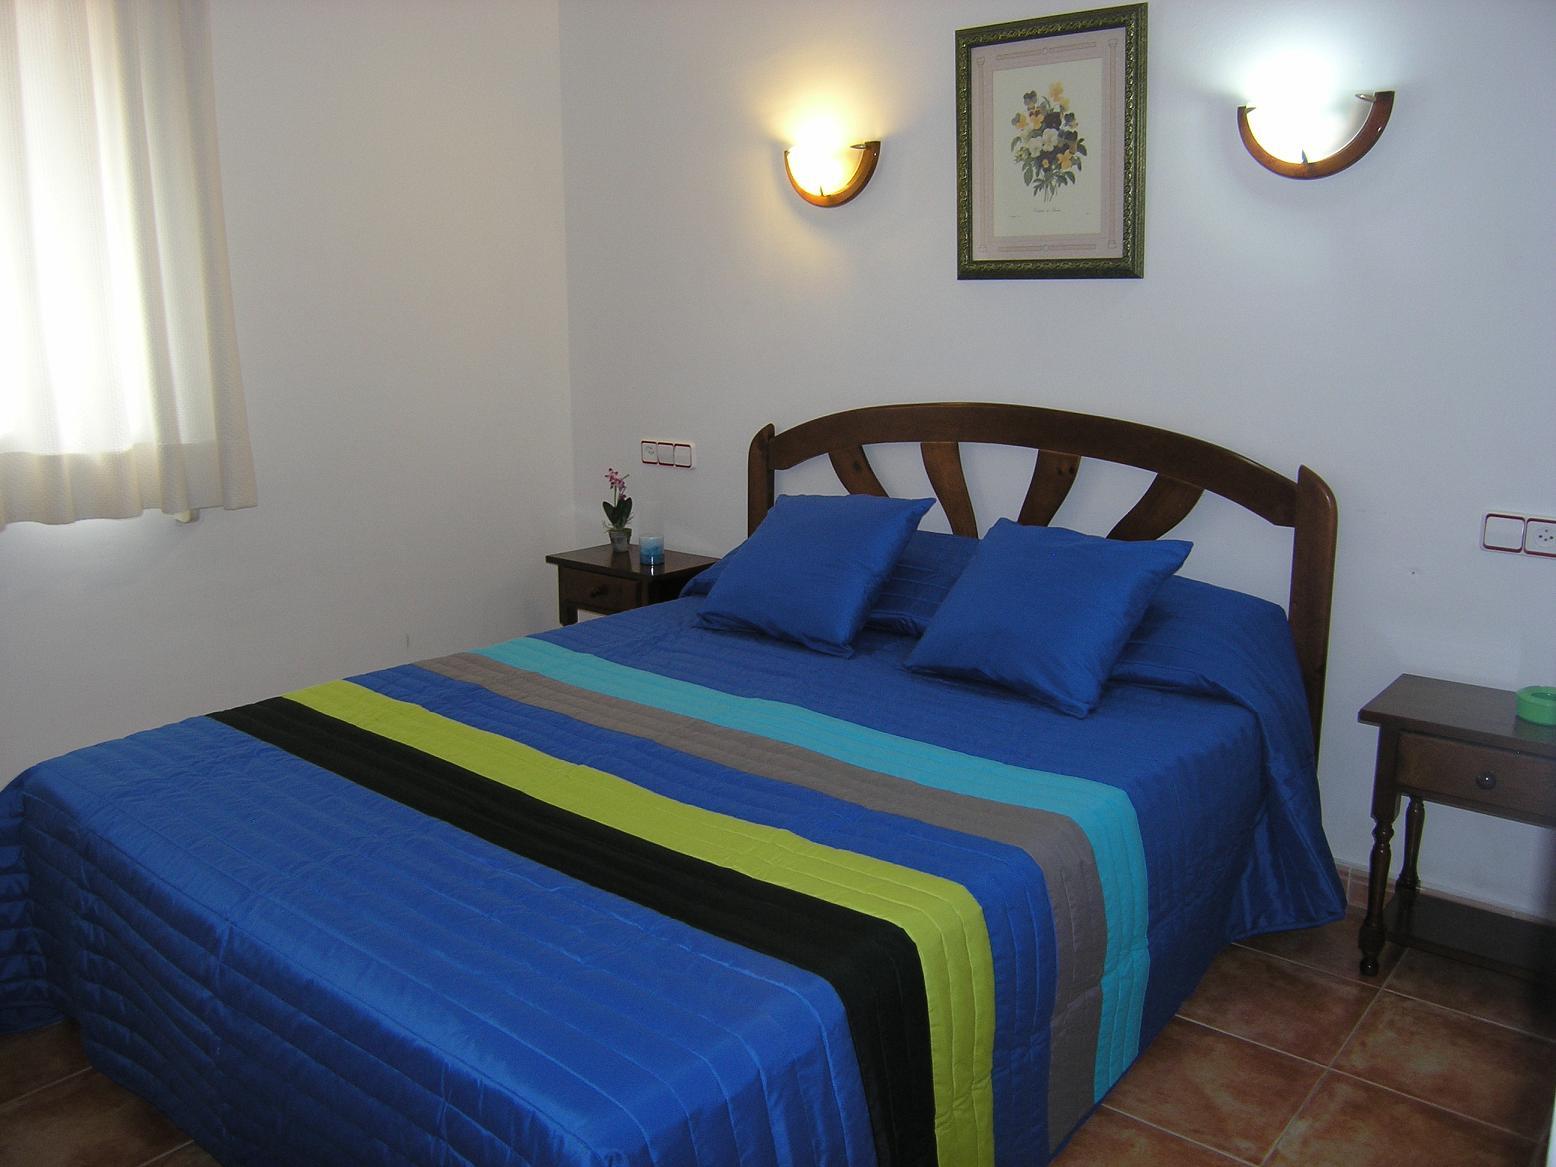 Location villa / maison datil